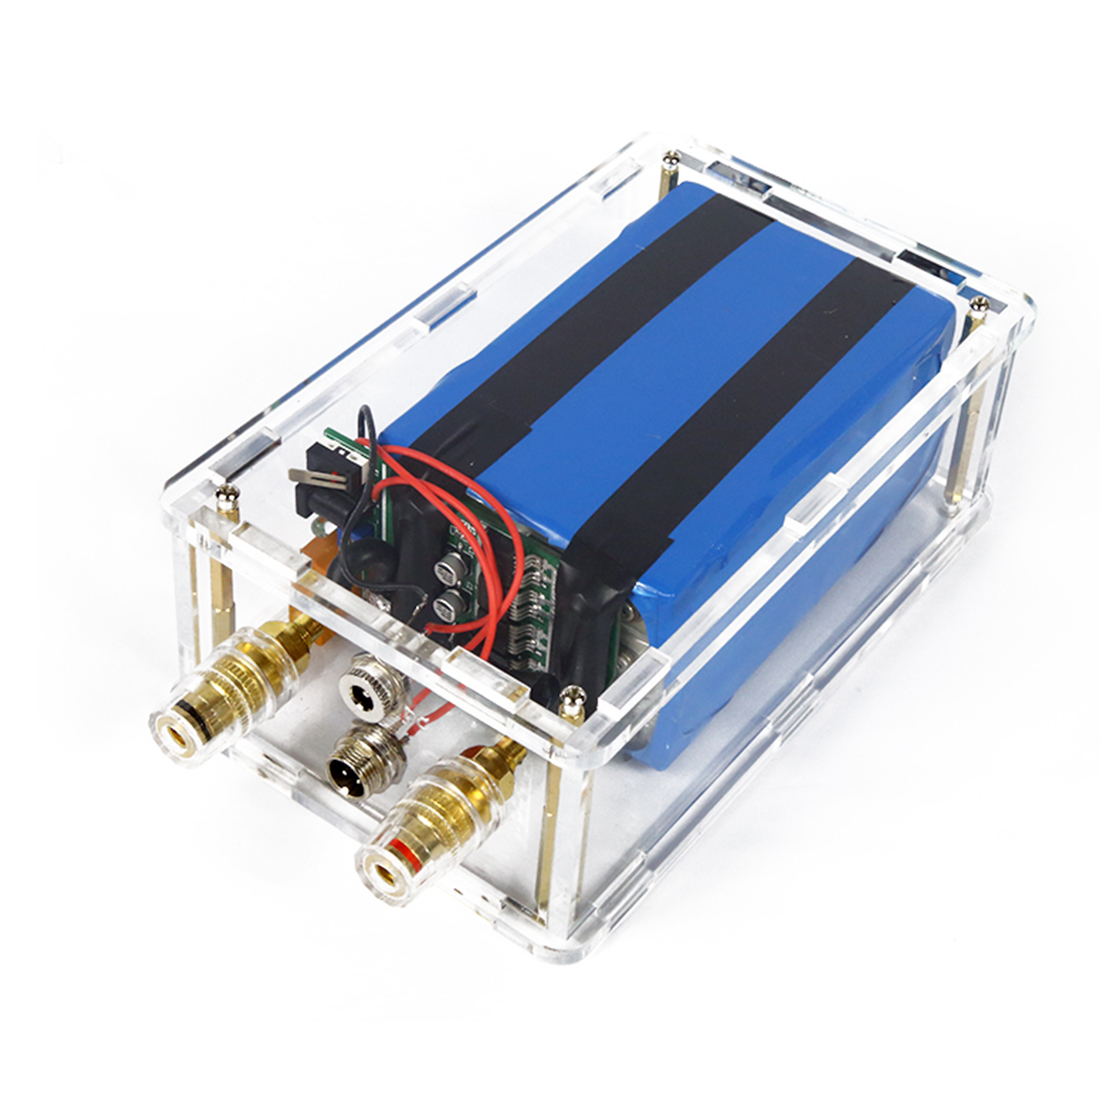 DIY Portable Spot Welder Lithium Battery Powered Spot Welder With Acrylic Shell For Kids Developmental Early Educational Toys